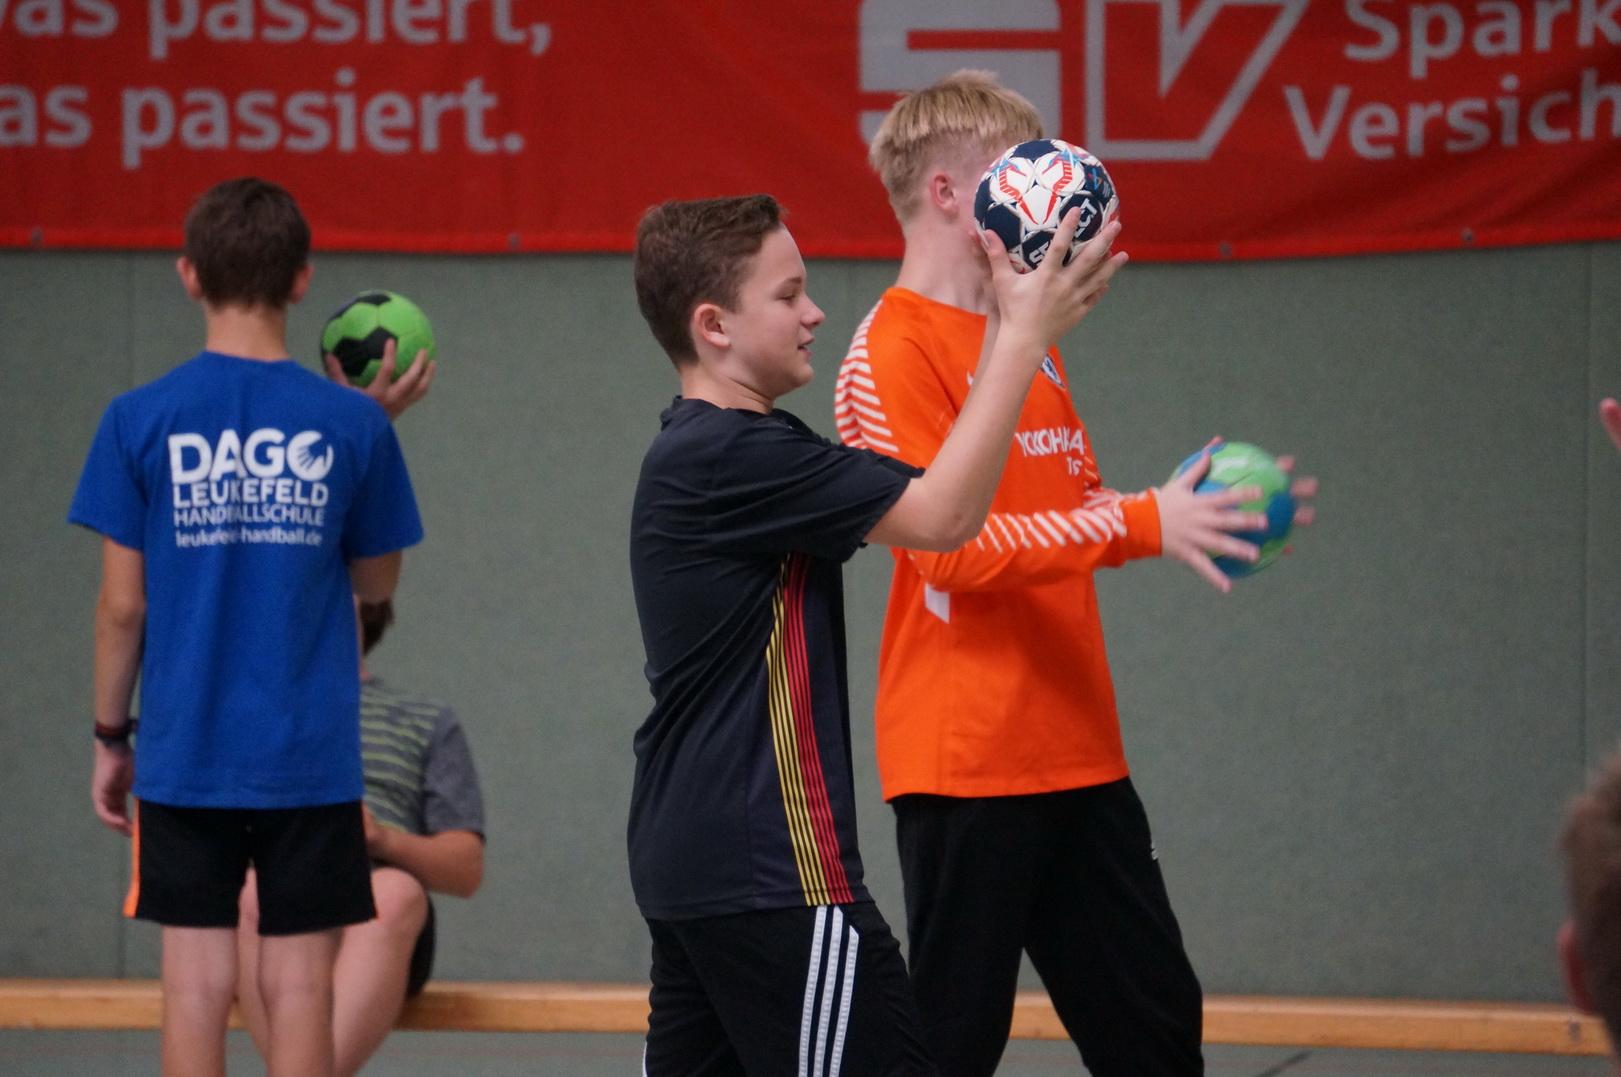 201808_Handballcamp_SDH_MG_189w